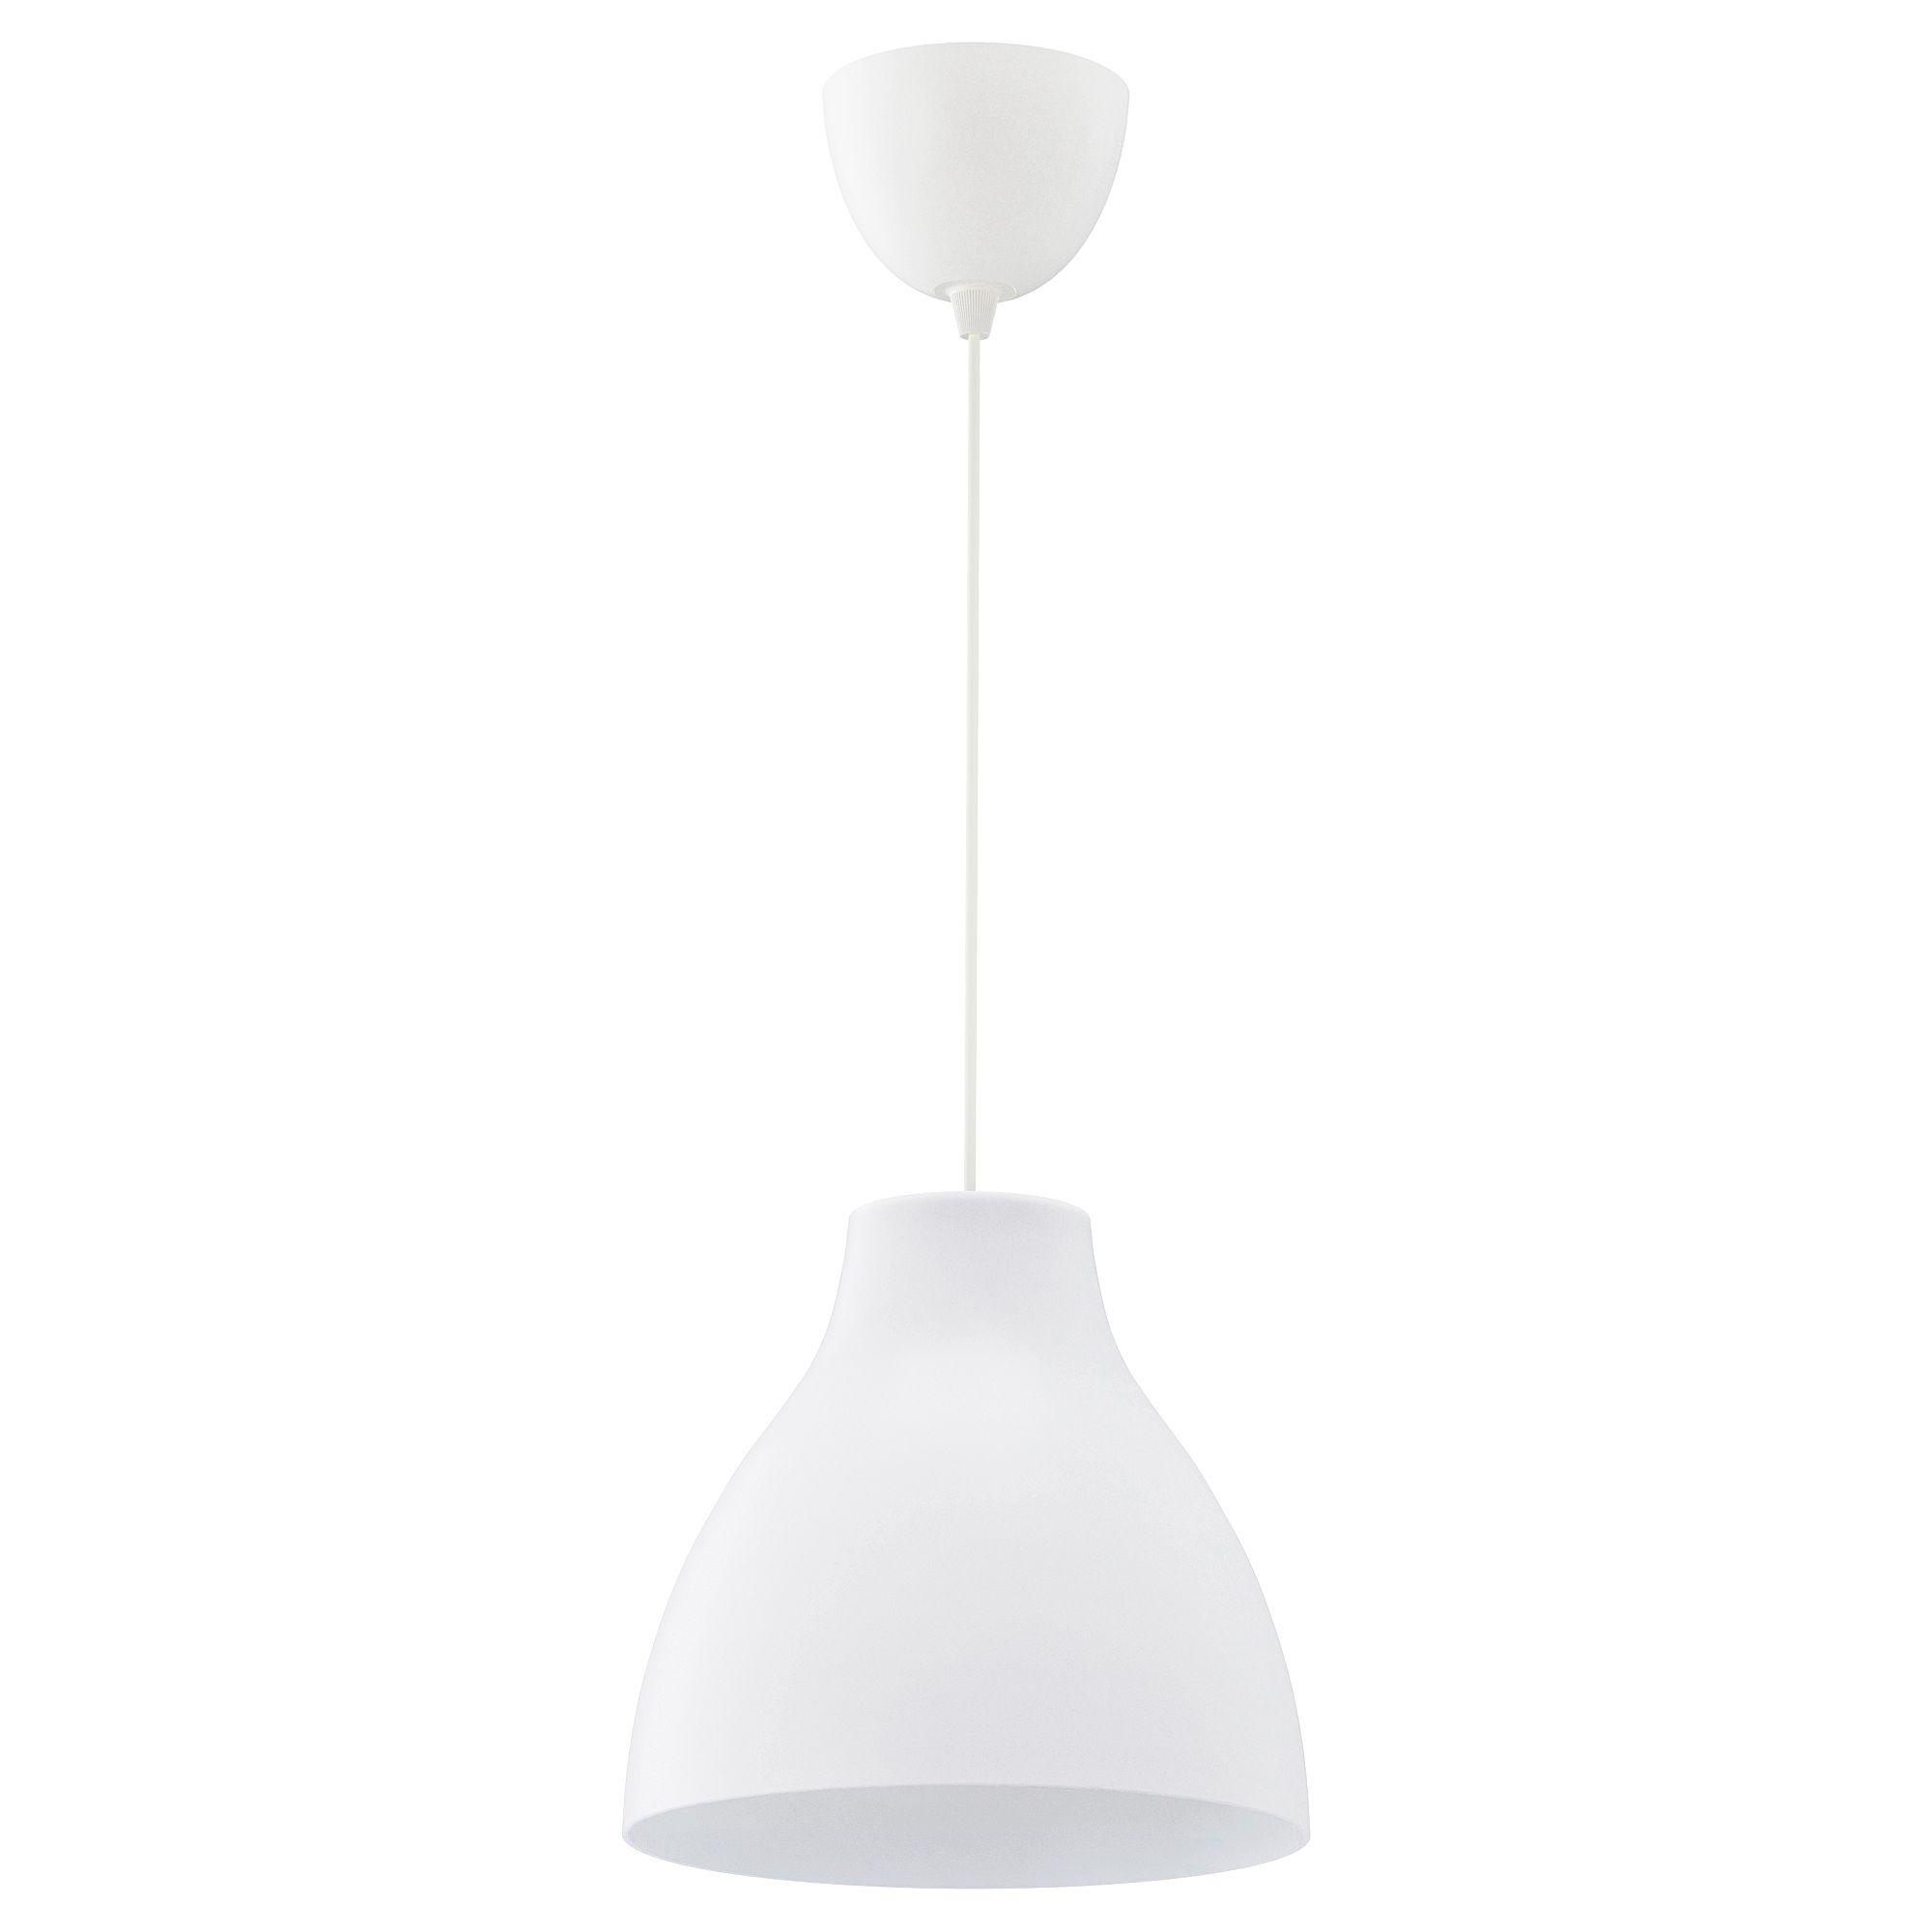 IKEA MELODI Pendant lamp white | Pendant lamp, Bathroom